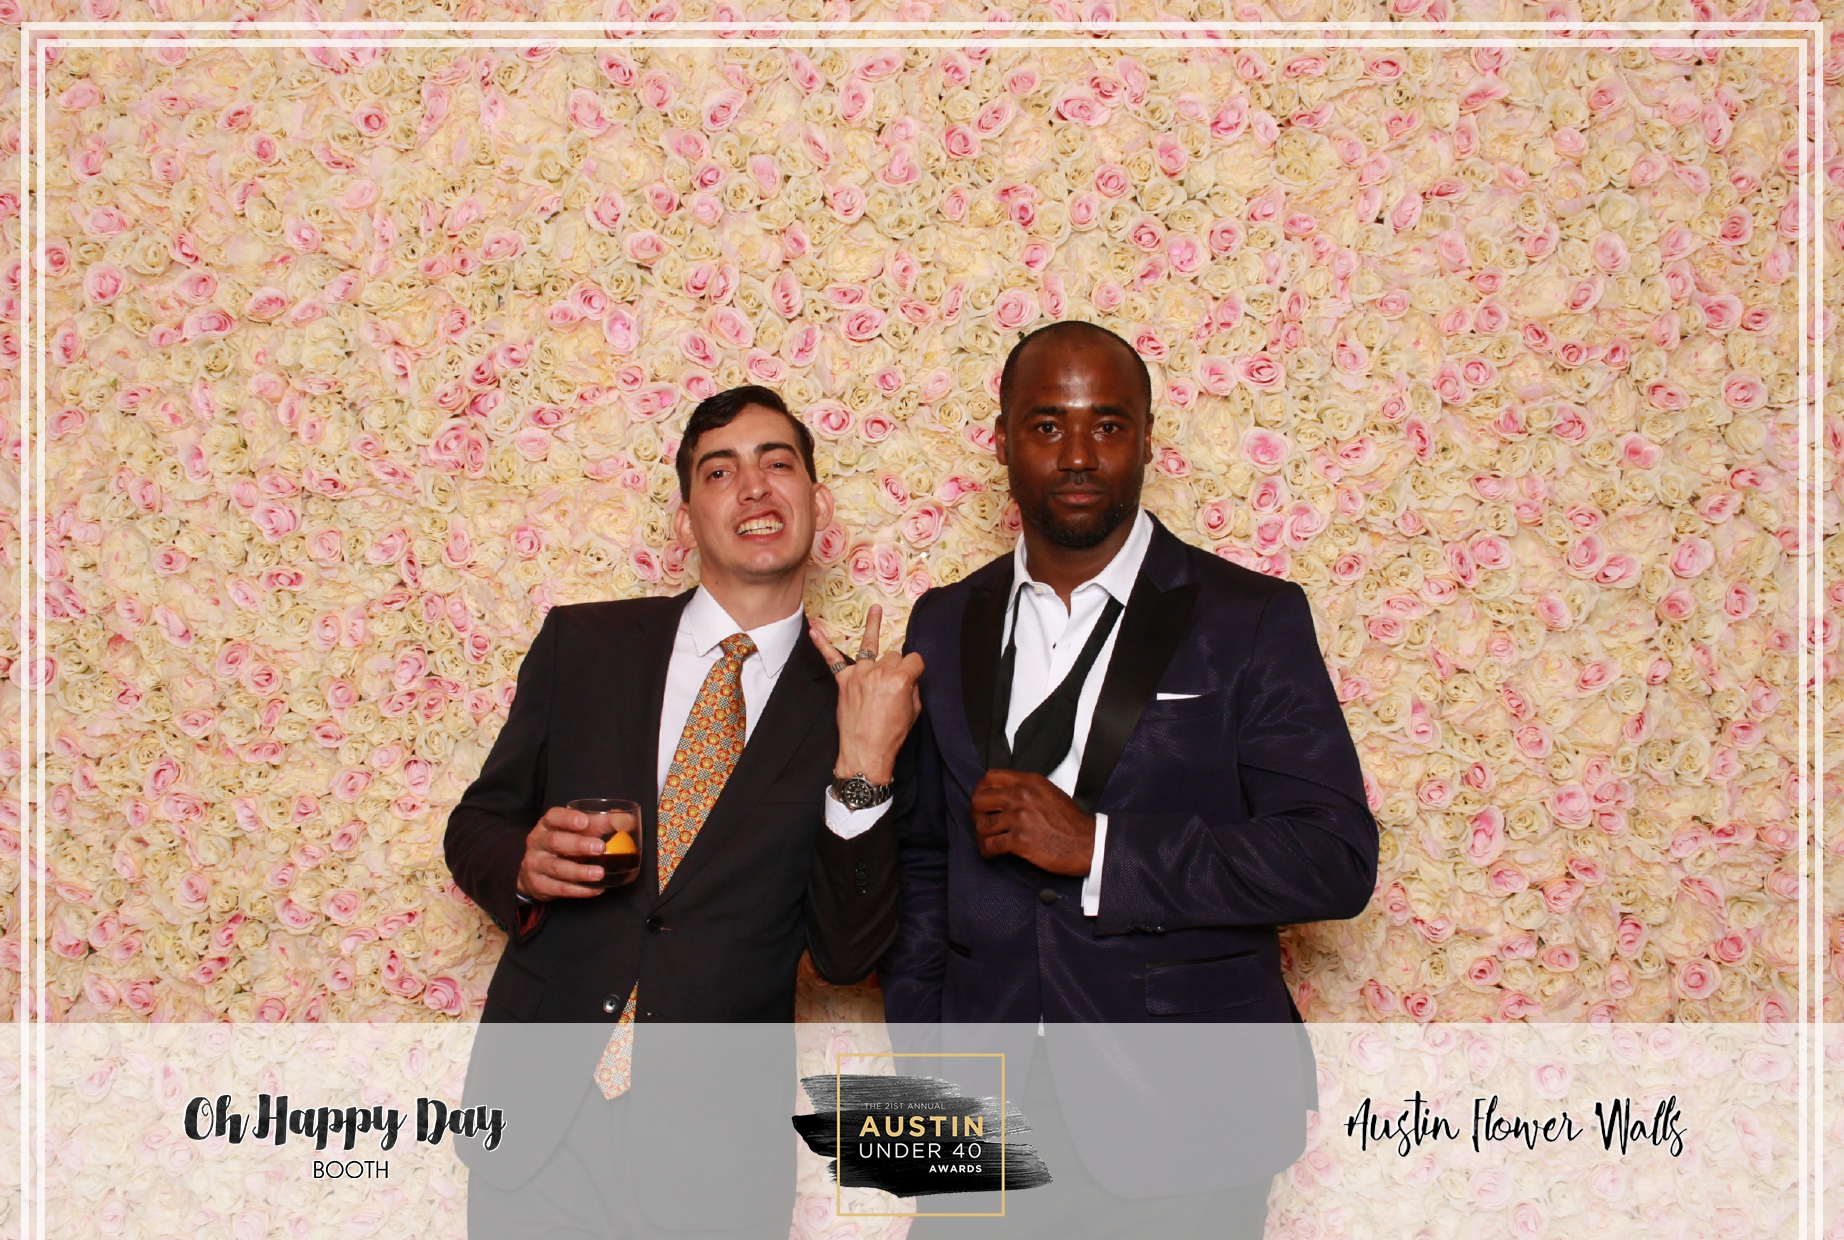 Oh Happy Day Booth - Austin Under 40-241.jpg